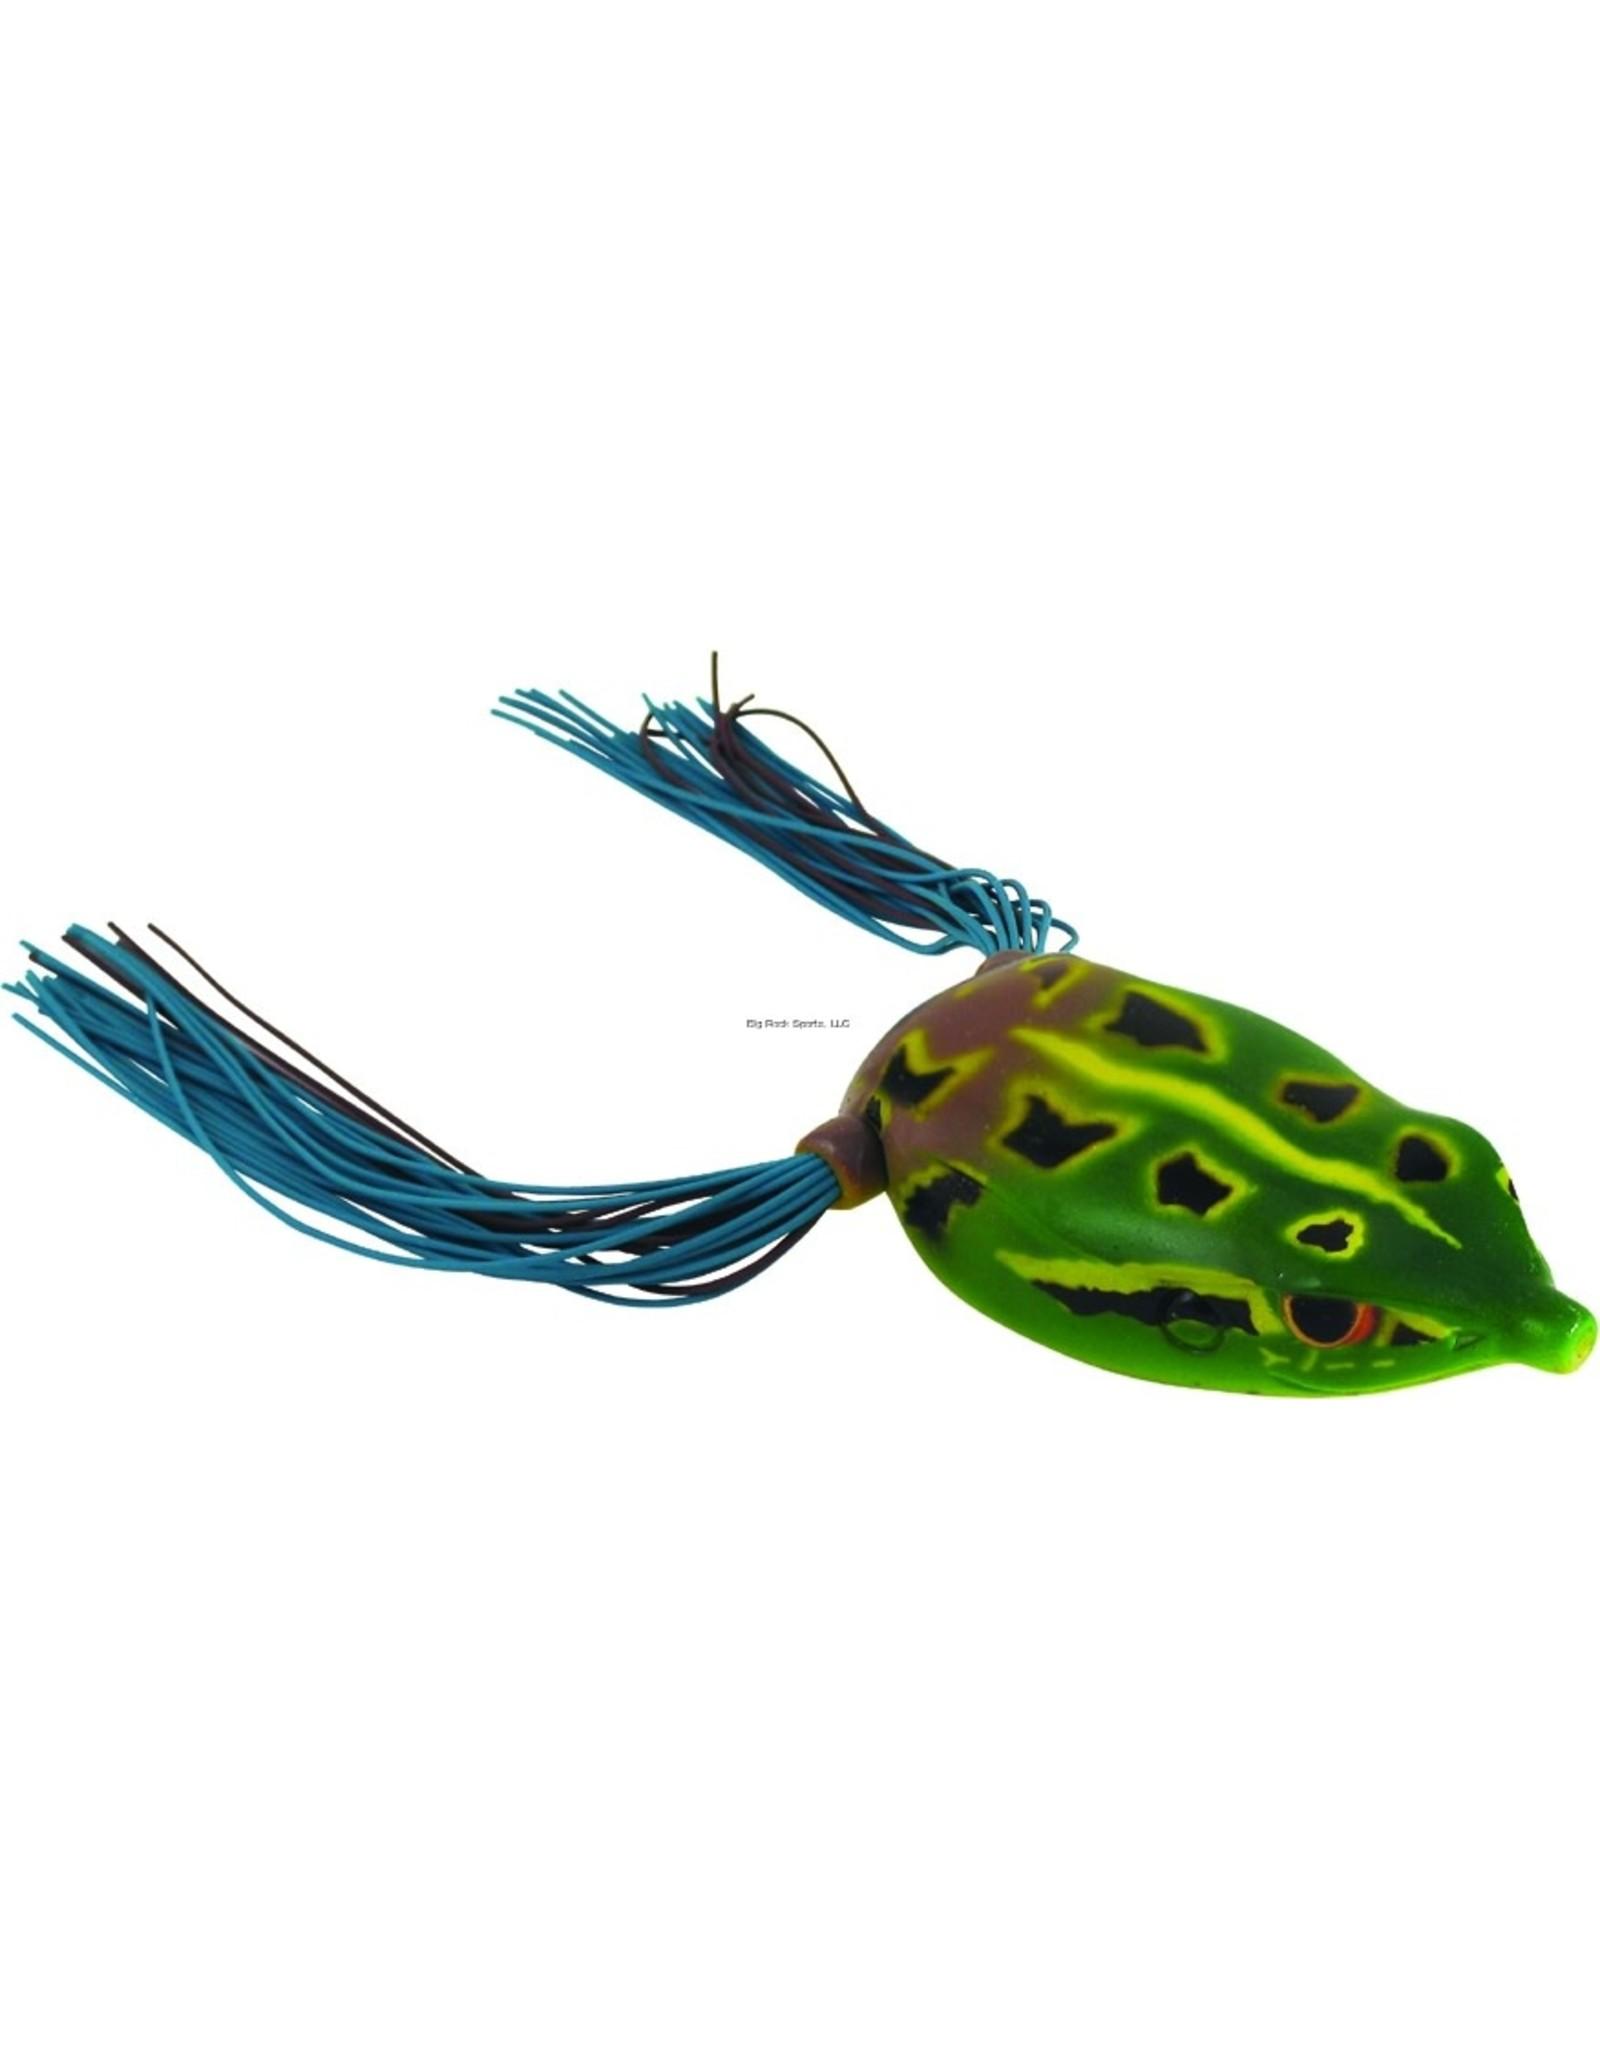 Spro Spro Bronzeye Frog 65